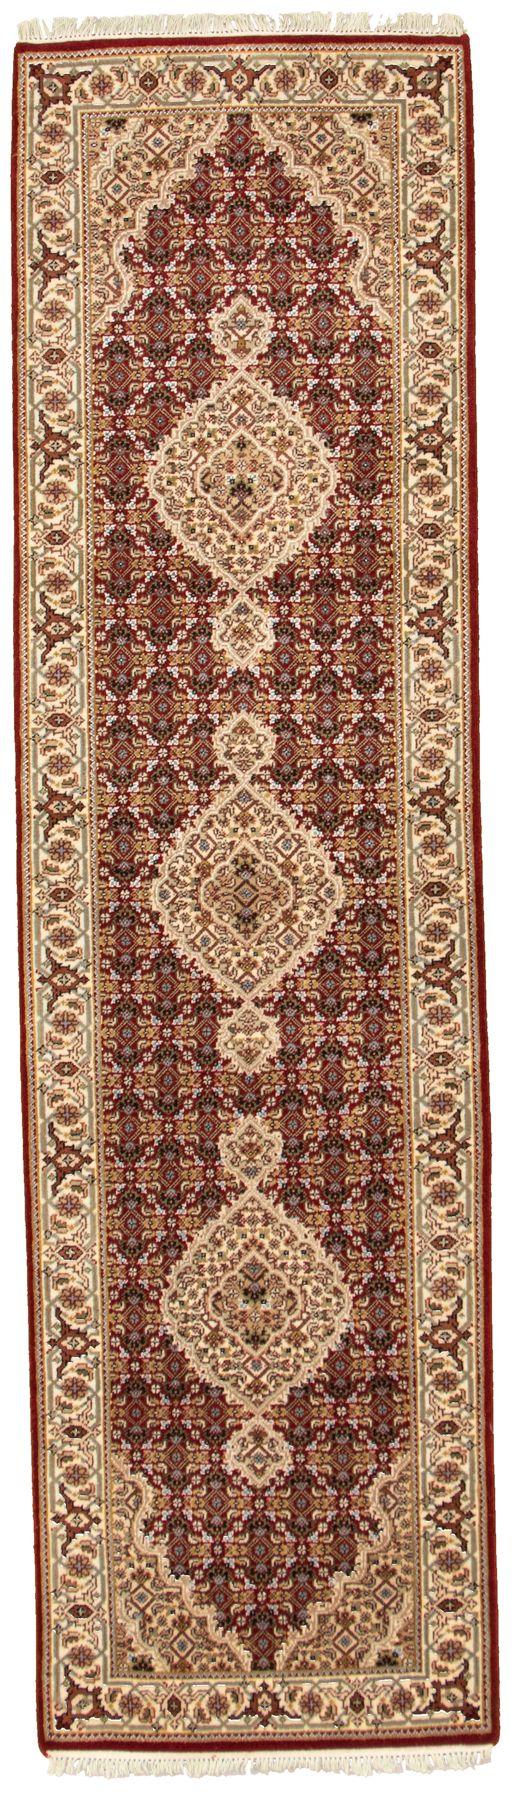 "Hand-knotted Tabriz Haj Jalili Red Wool Rug 2'8"" x 9'11"" Size: 2'8"" x 9'11"""